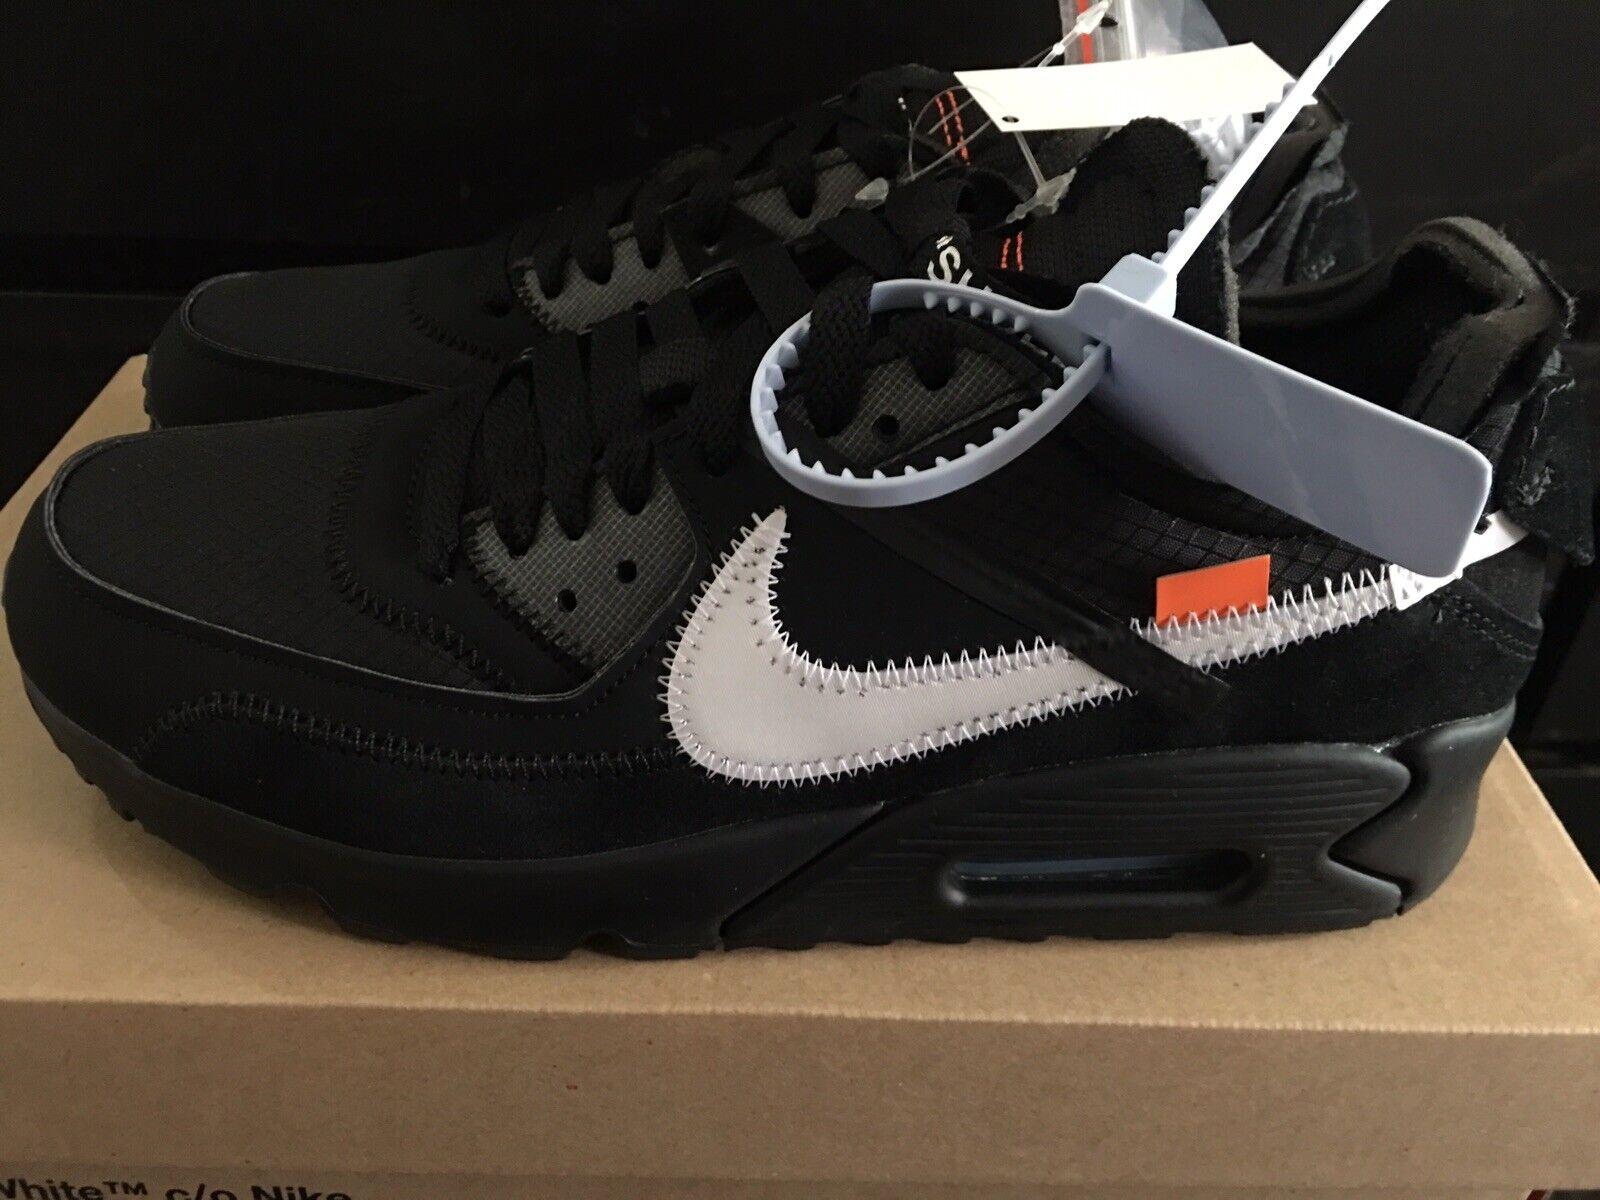 Off-White x Nike Air Max 90 Black   Black-Cone-White AA7293-001 Size 7.5